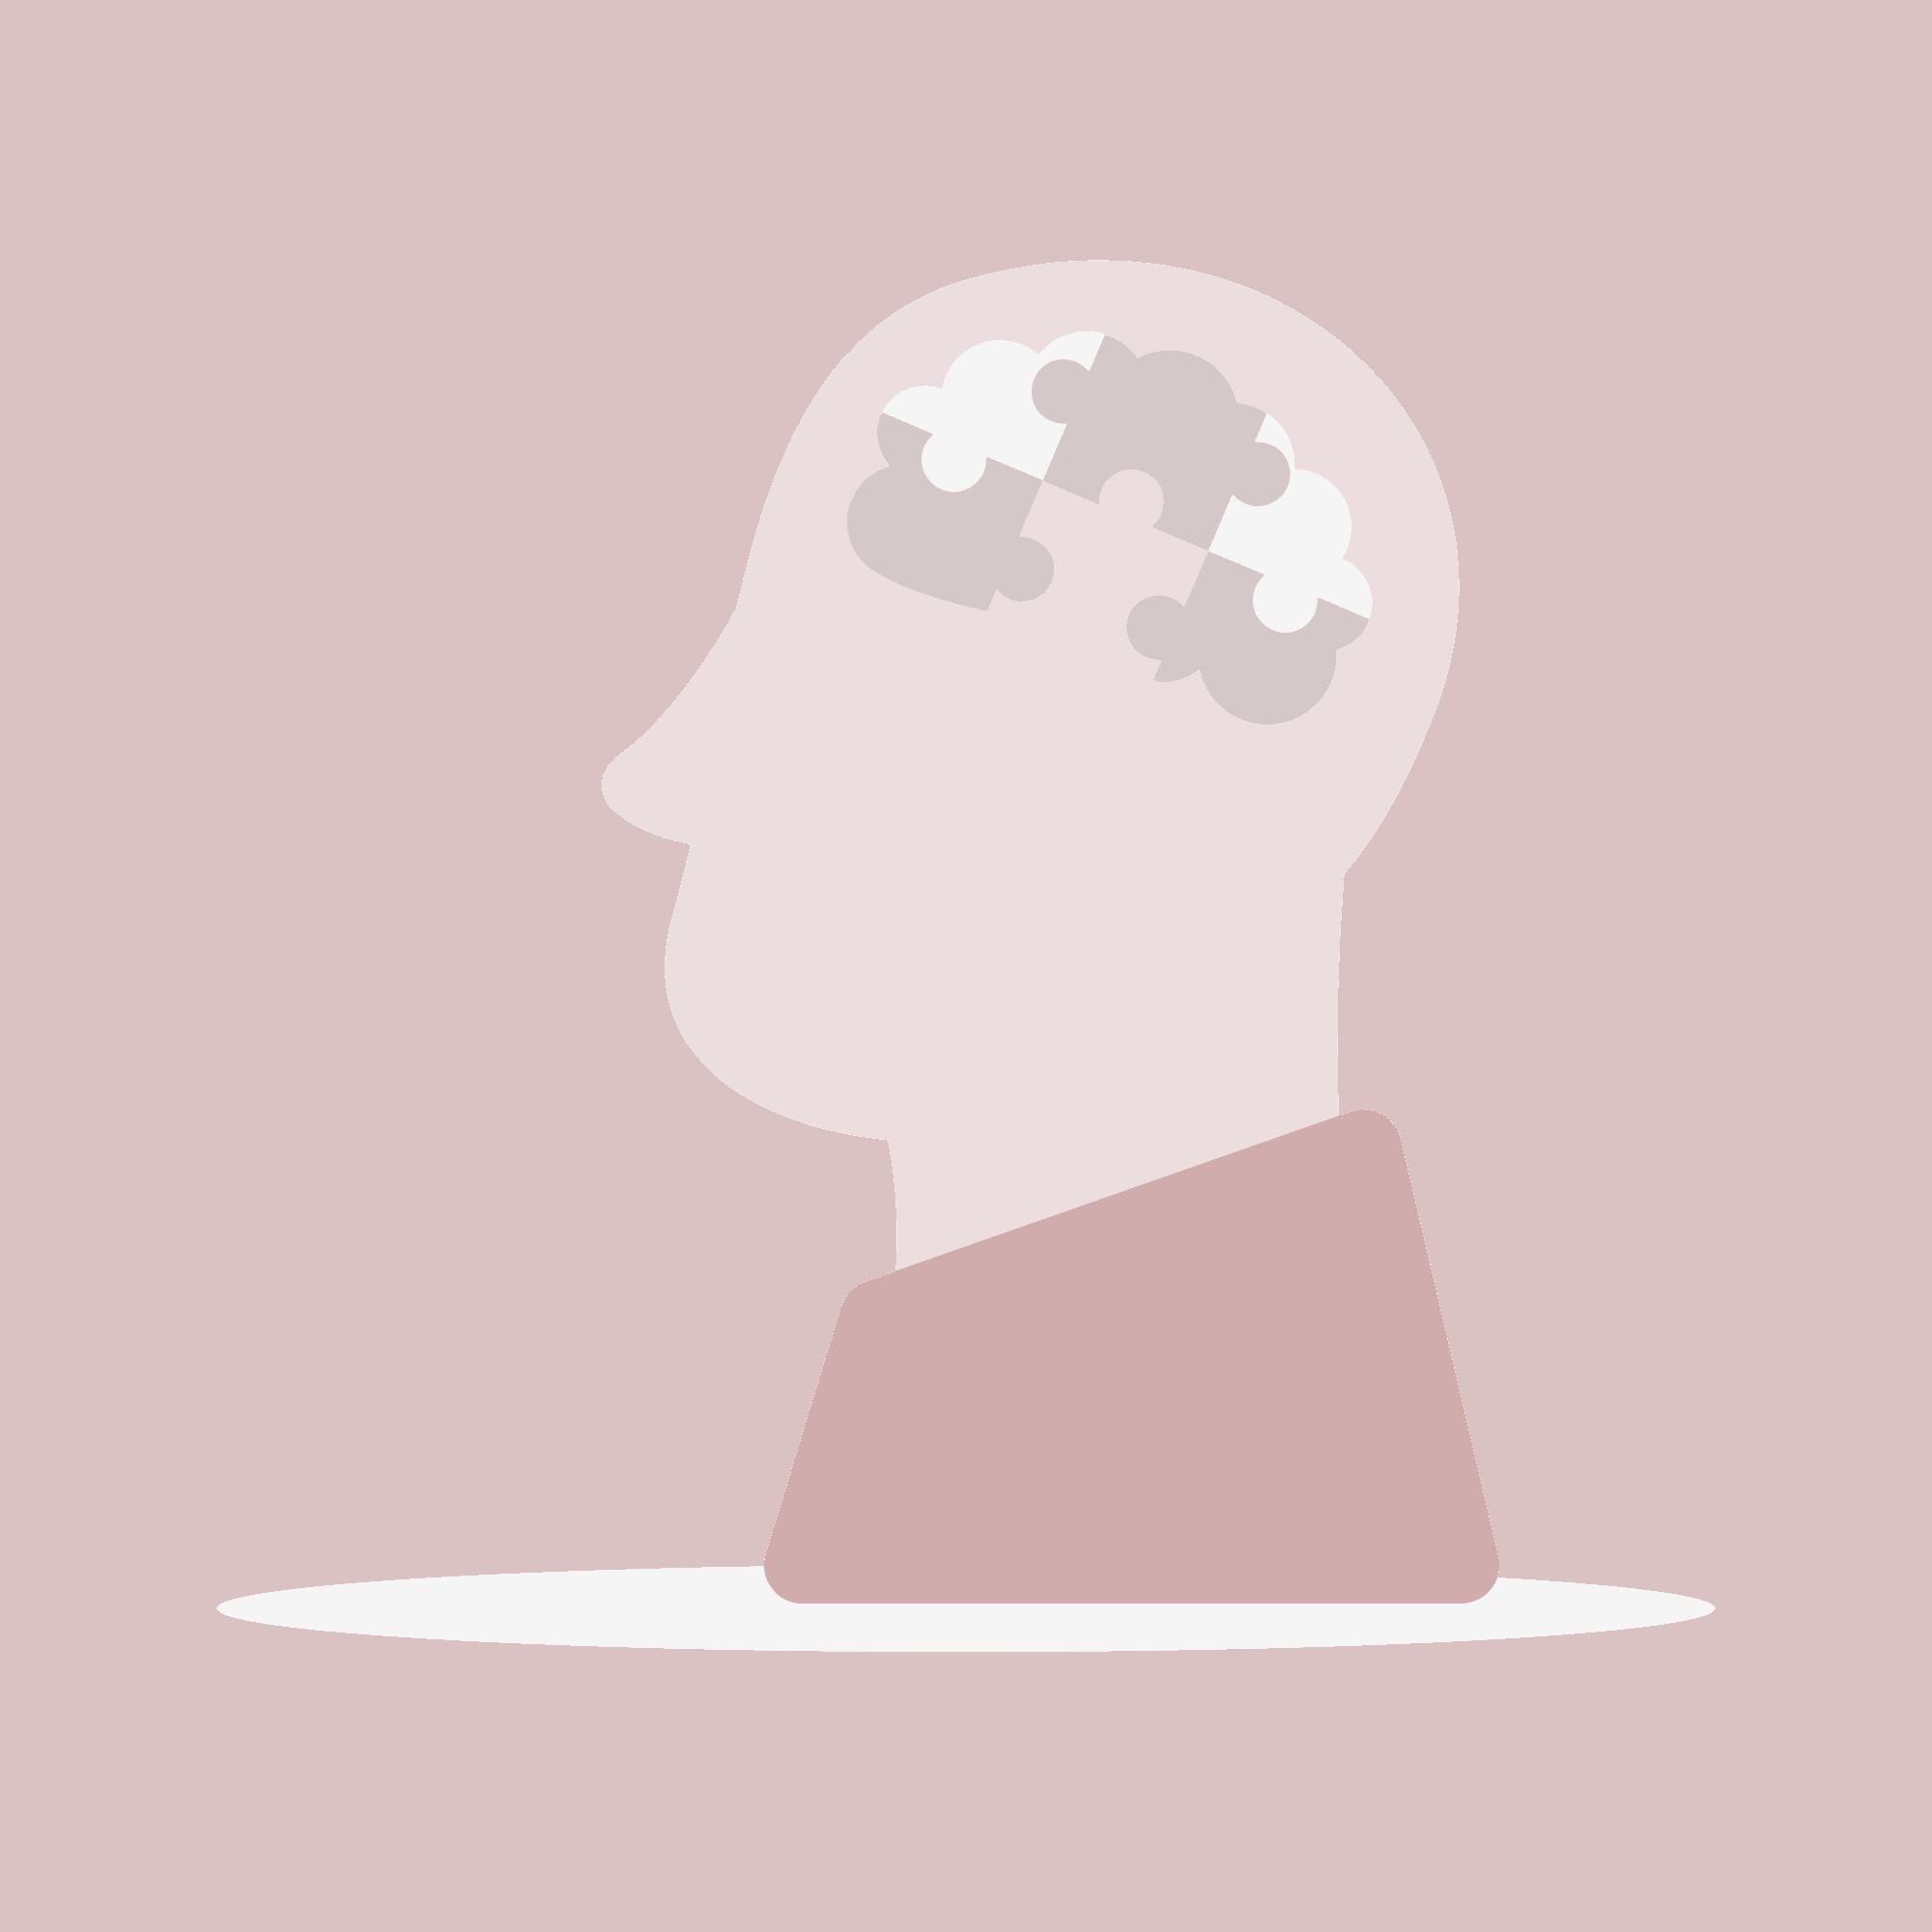 Git HEAD fundamentals [Updated]